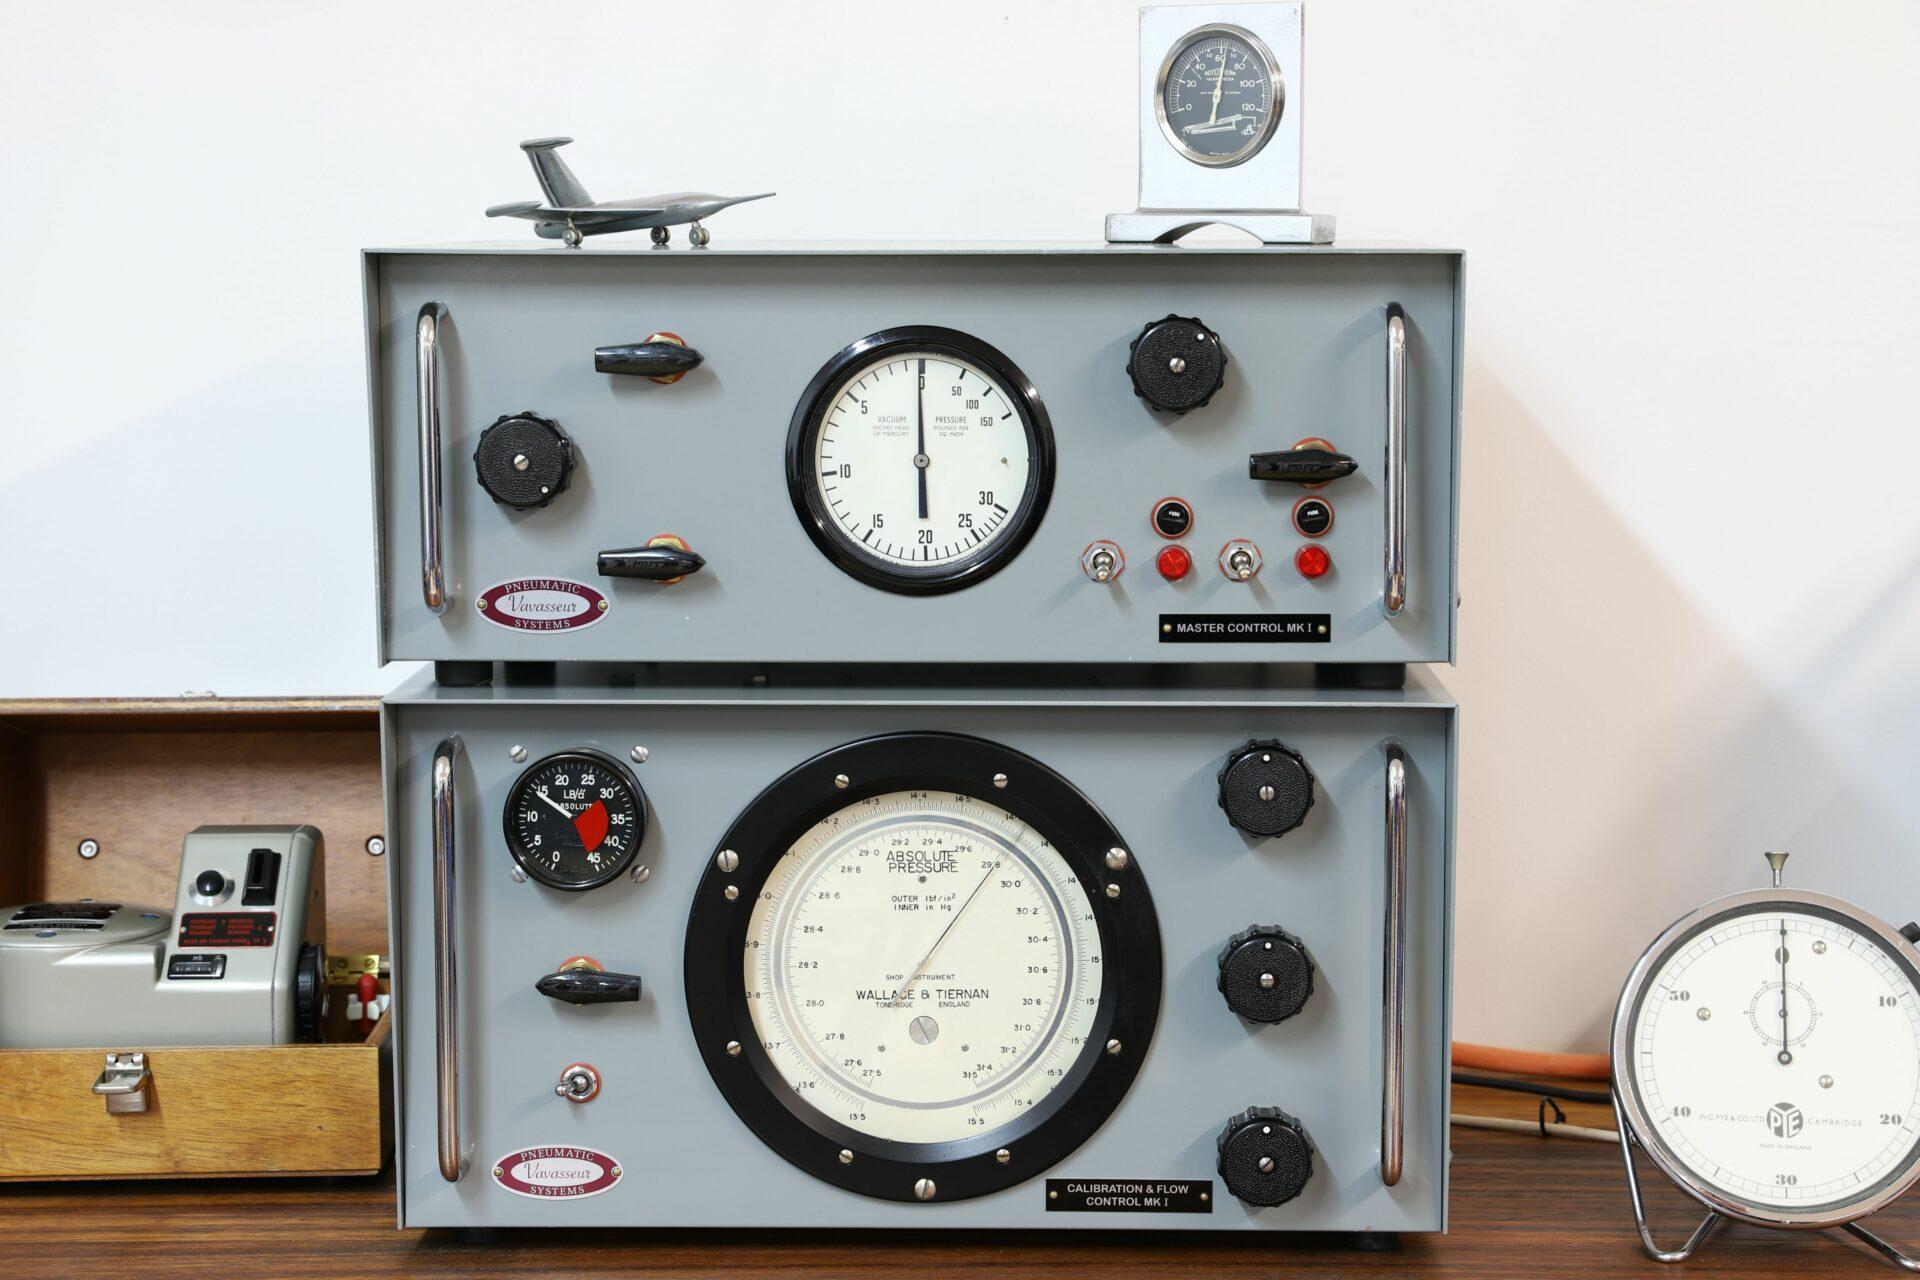 Image of Vavasseur Laboratory Test Equipment calibration units